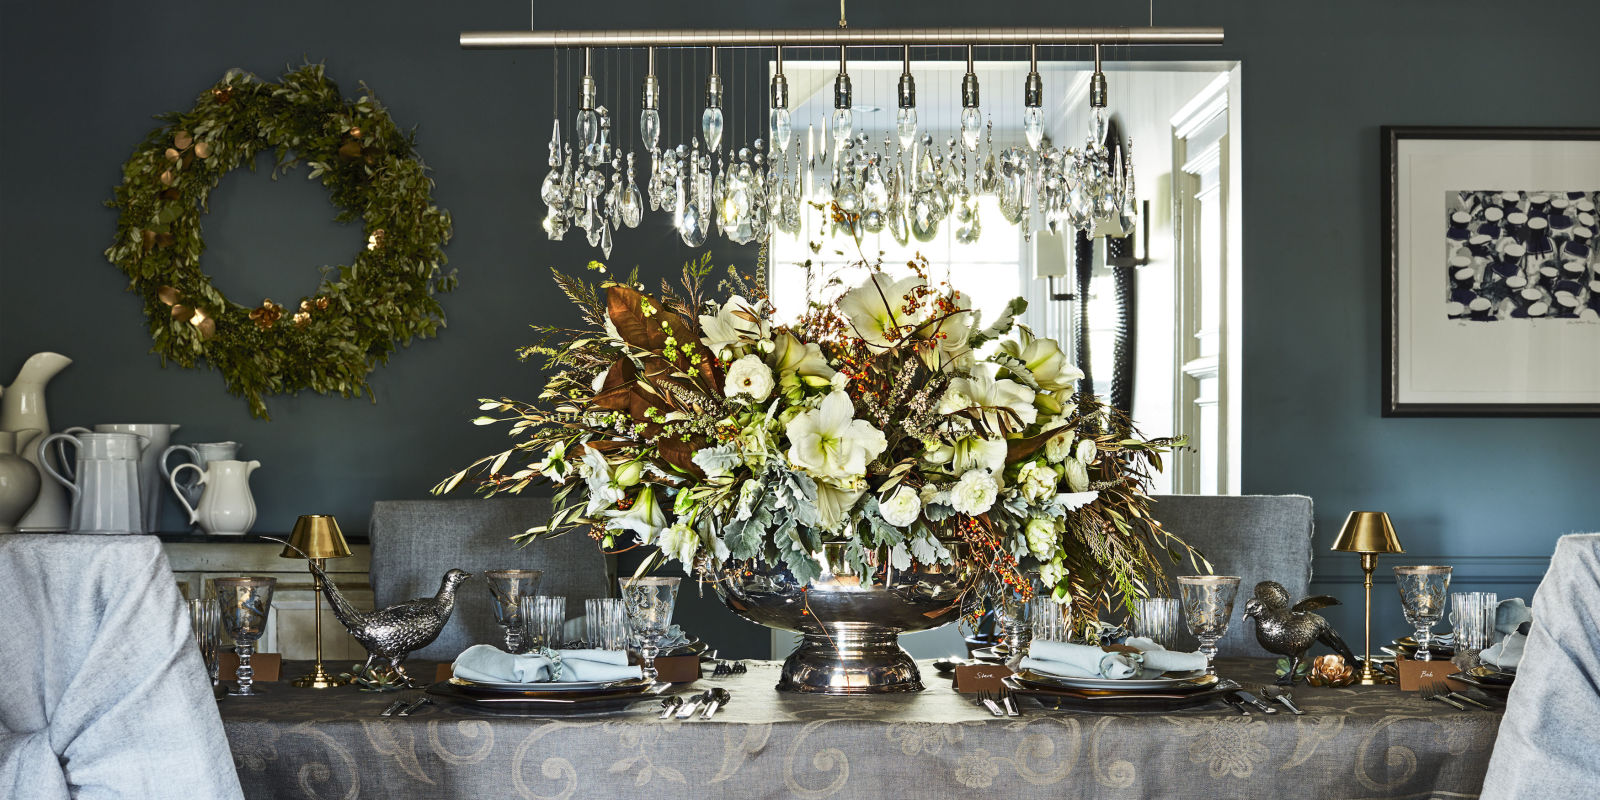 50 table setting decorations centerpieces best tablescape ideas tablescapes